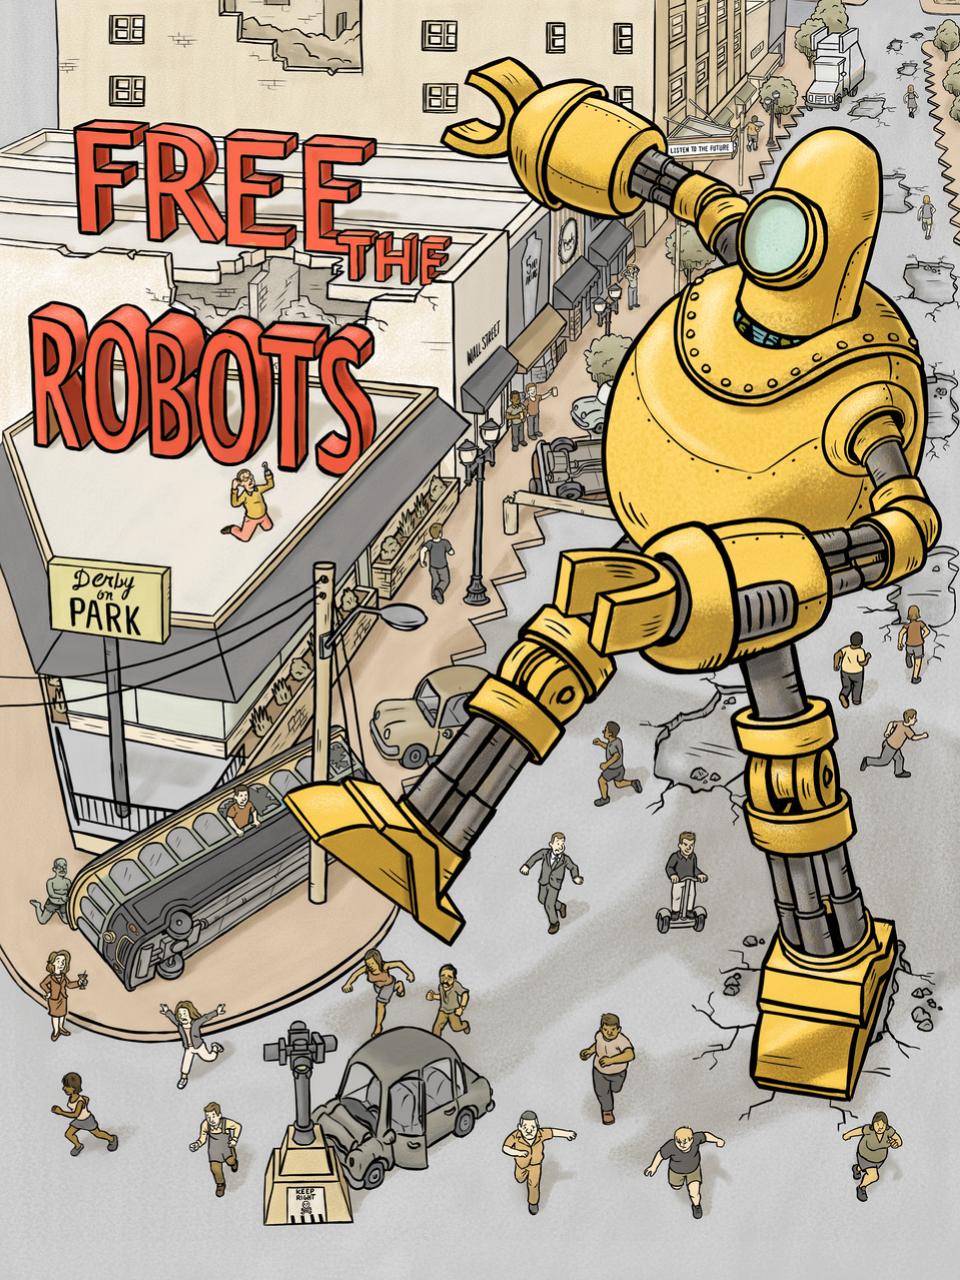 jack_spellman-free_the_robots